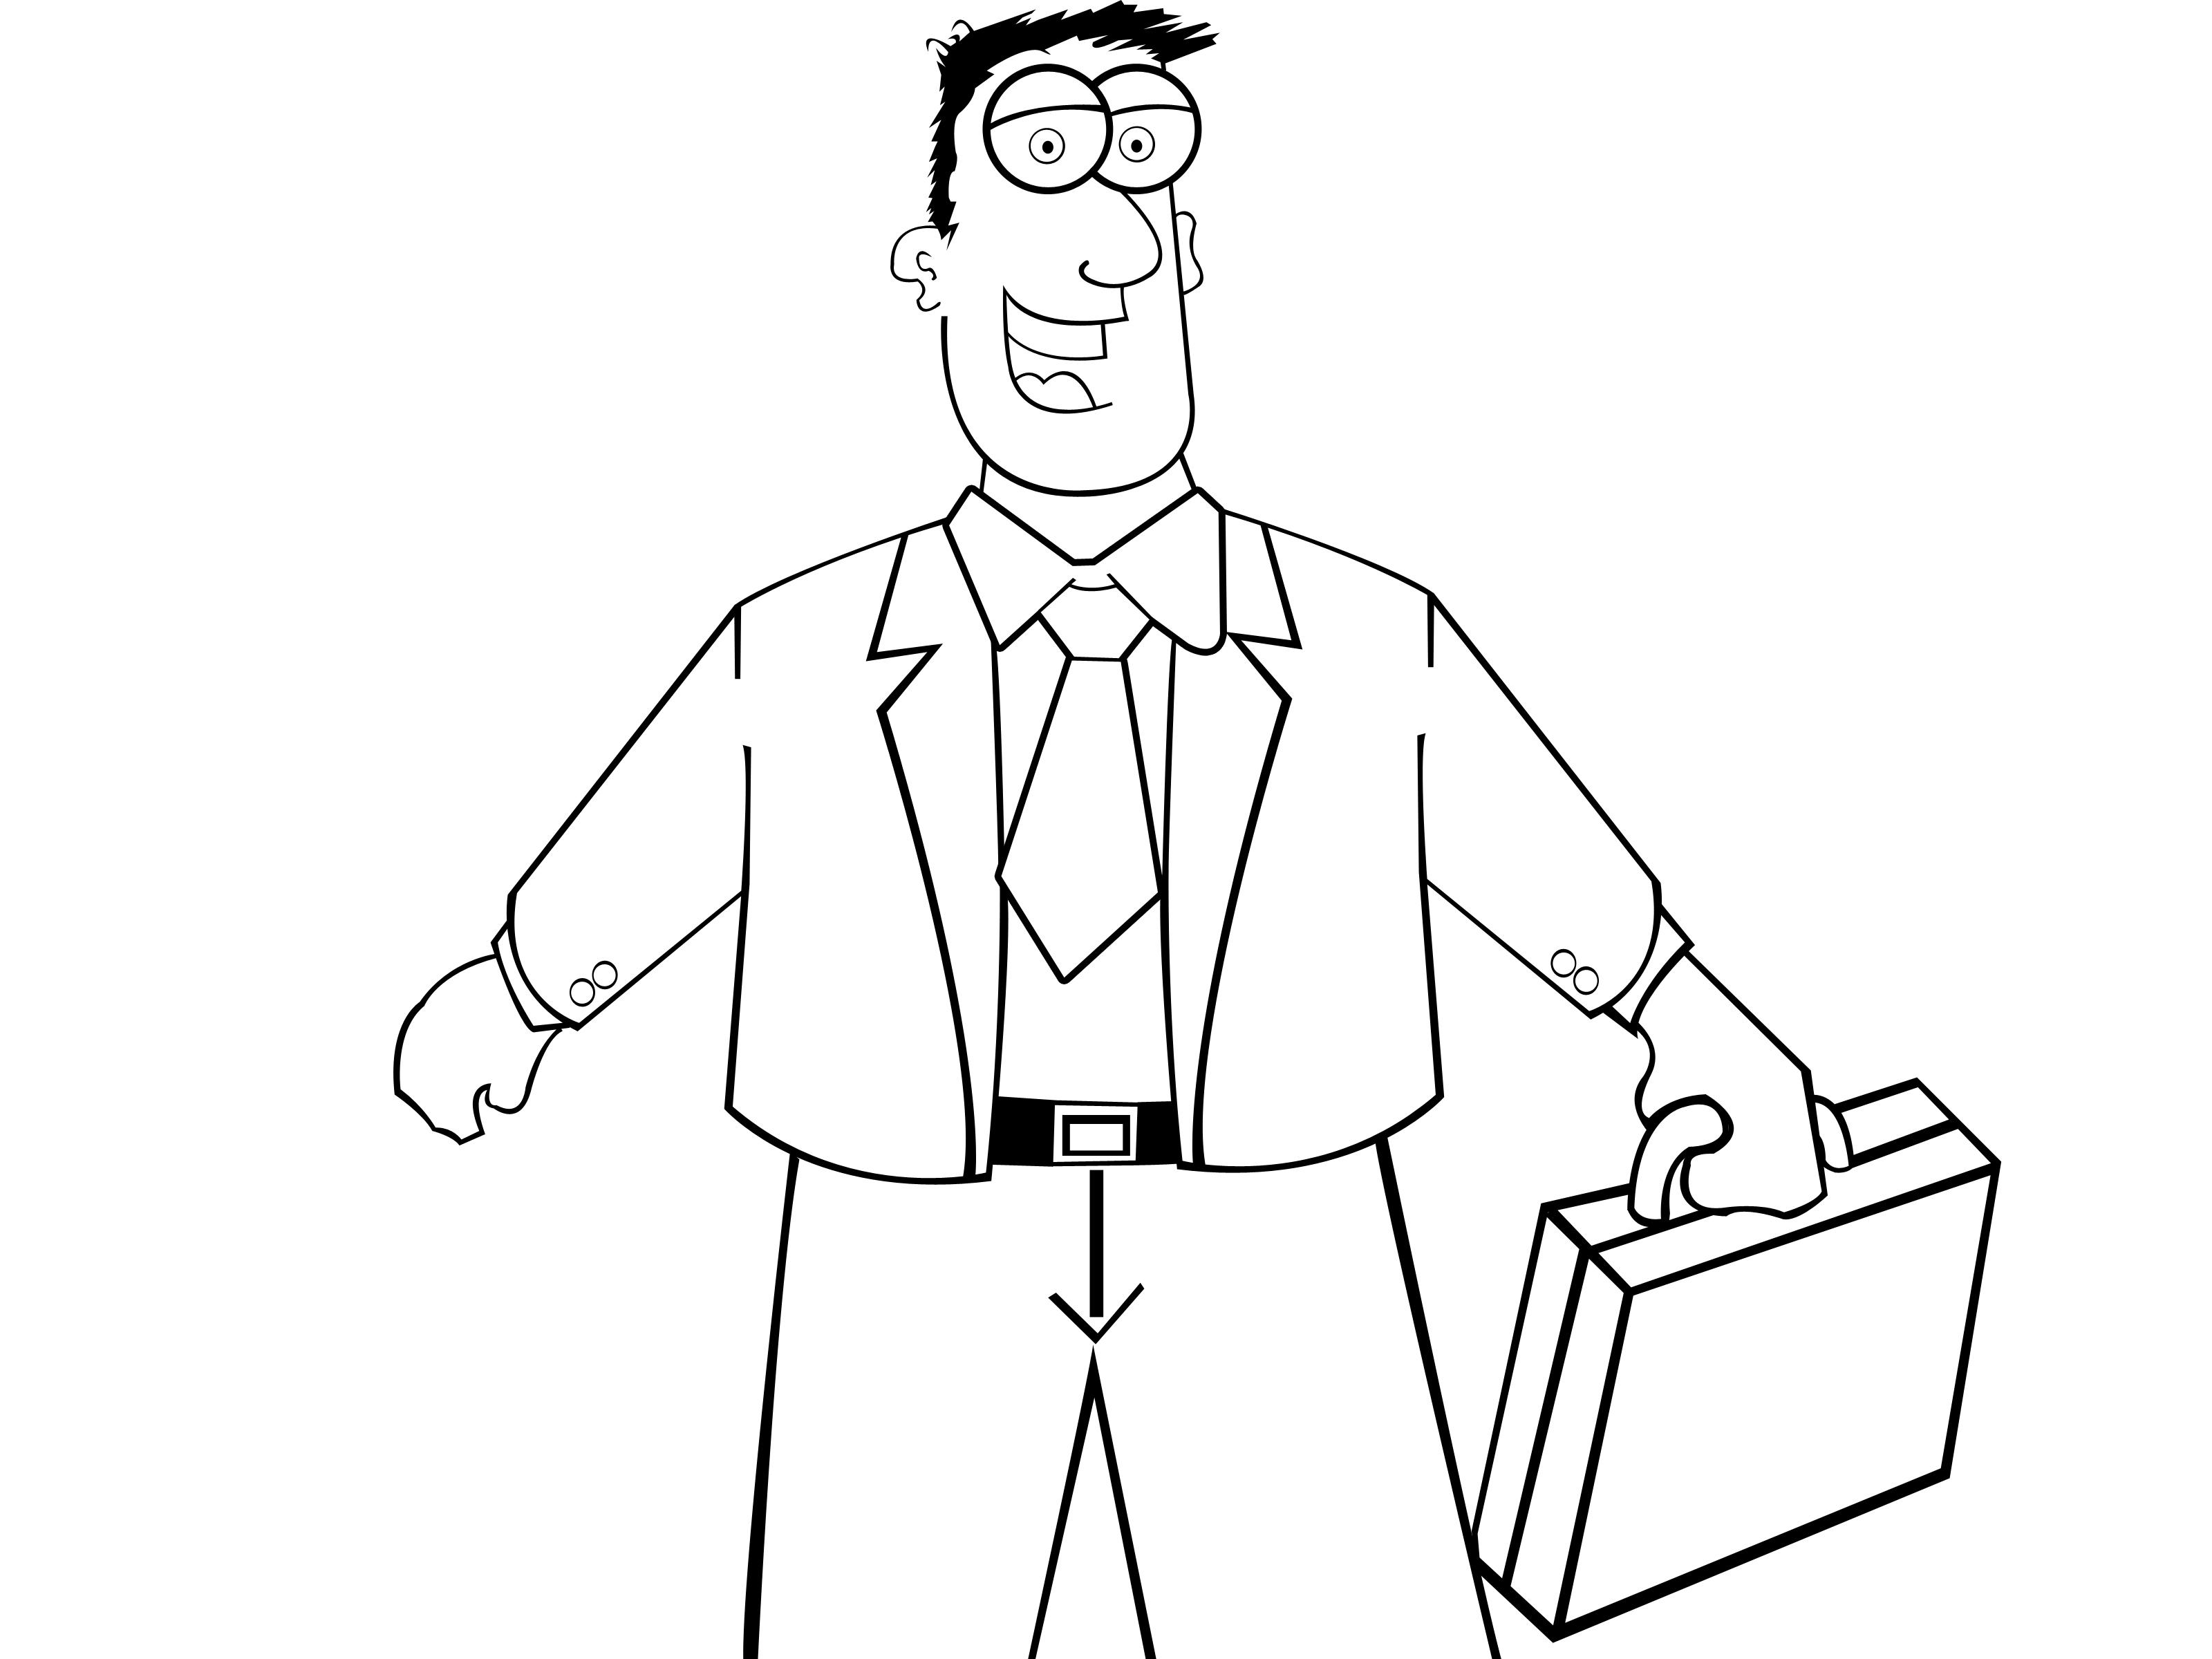 3200x2400 Drawing Cartoon Man